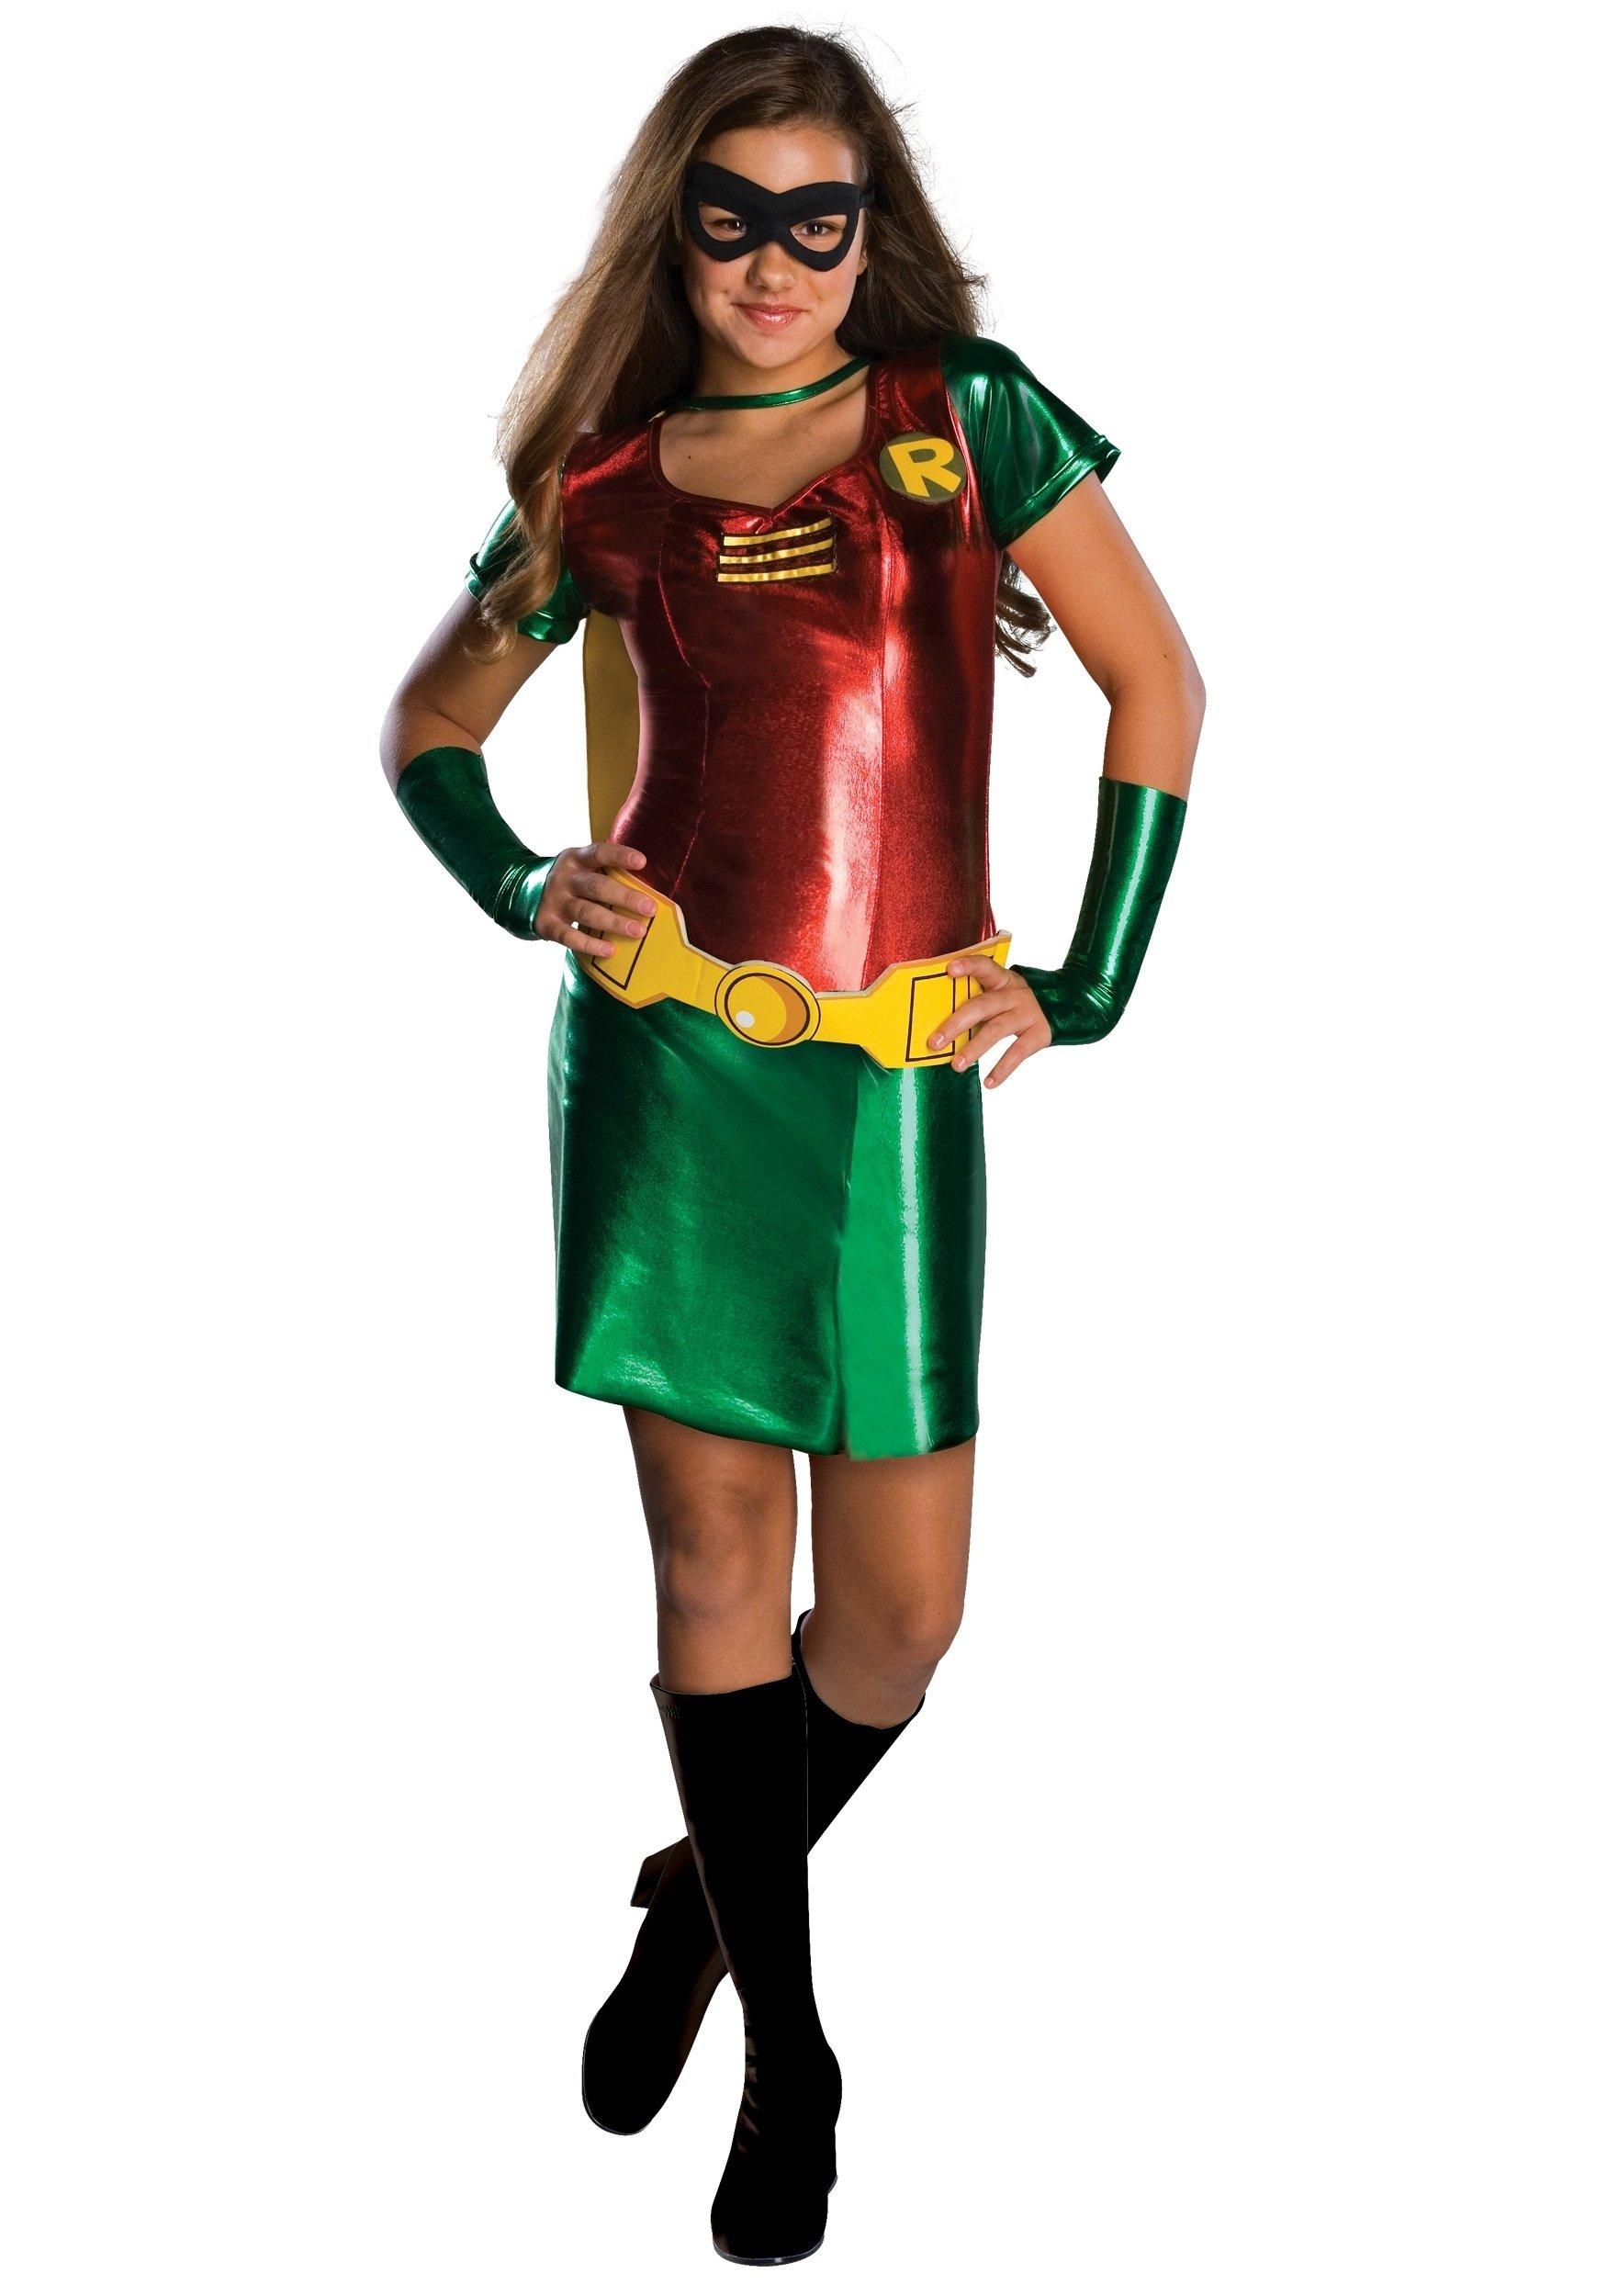 10 Stylish Superhero Costume Ideas For Women tween girls robin costume 1 2020